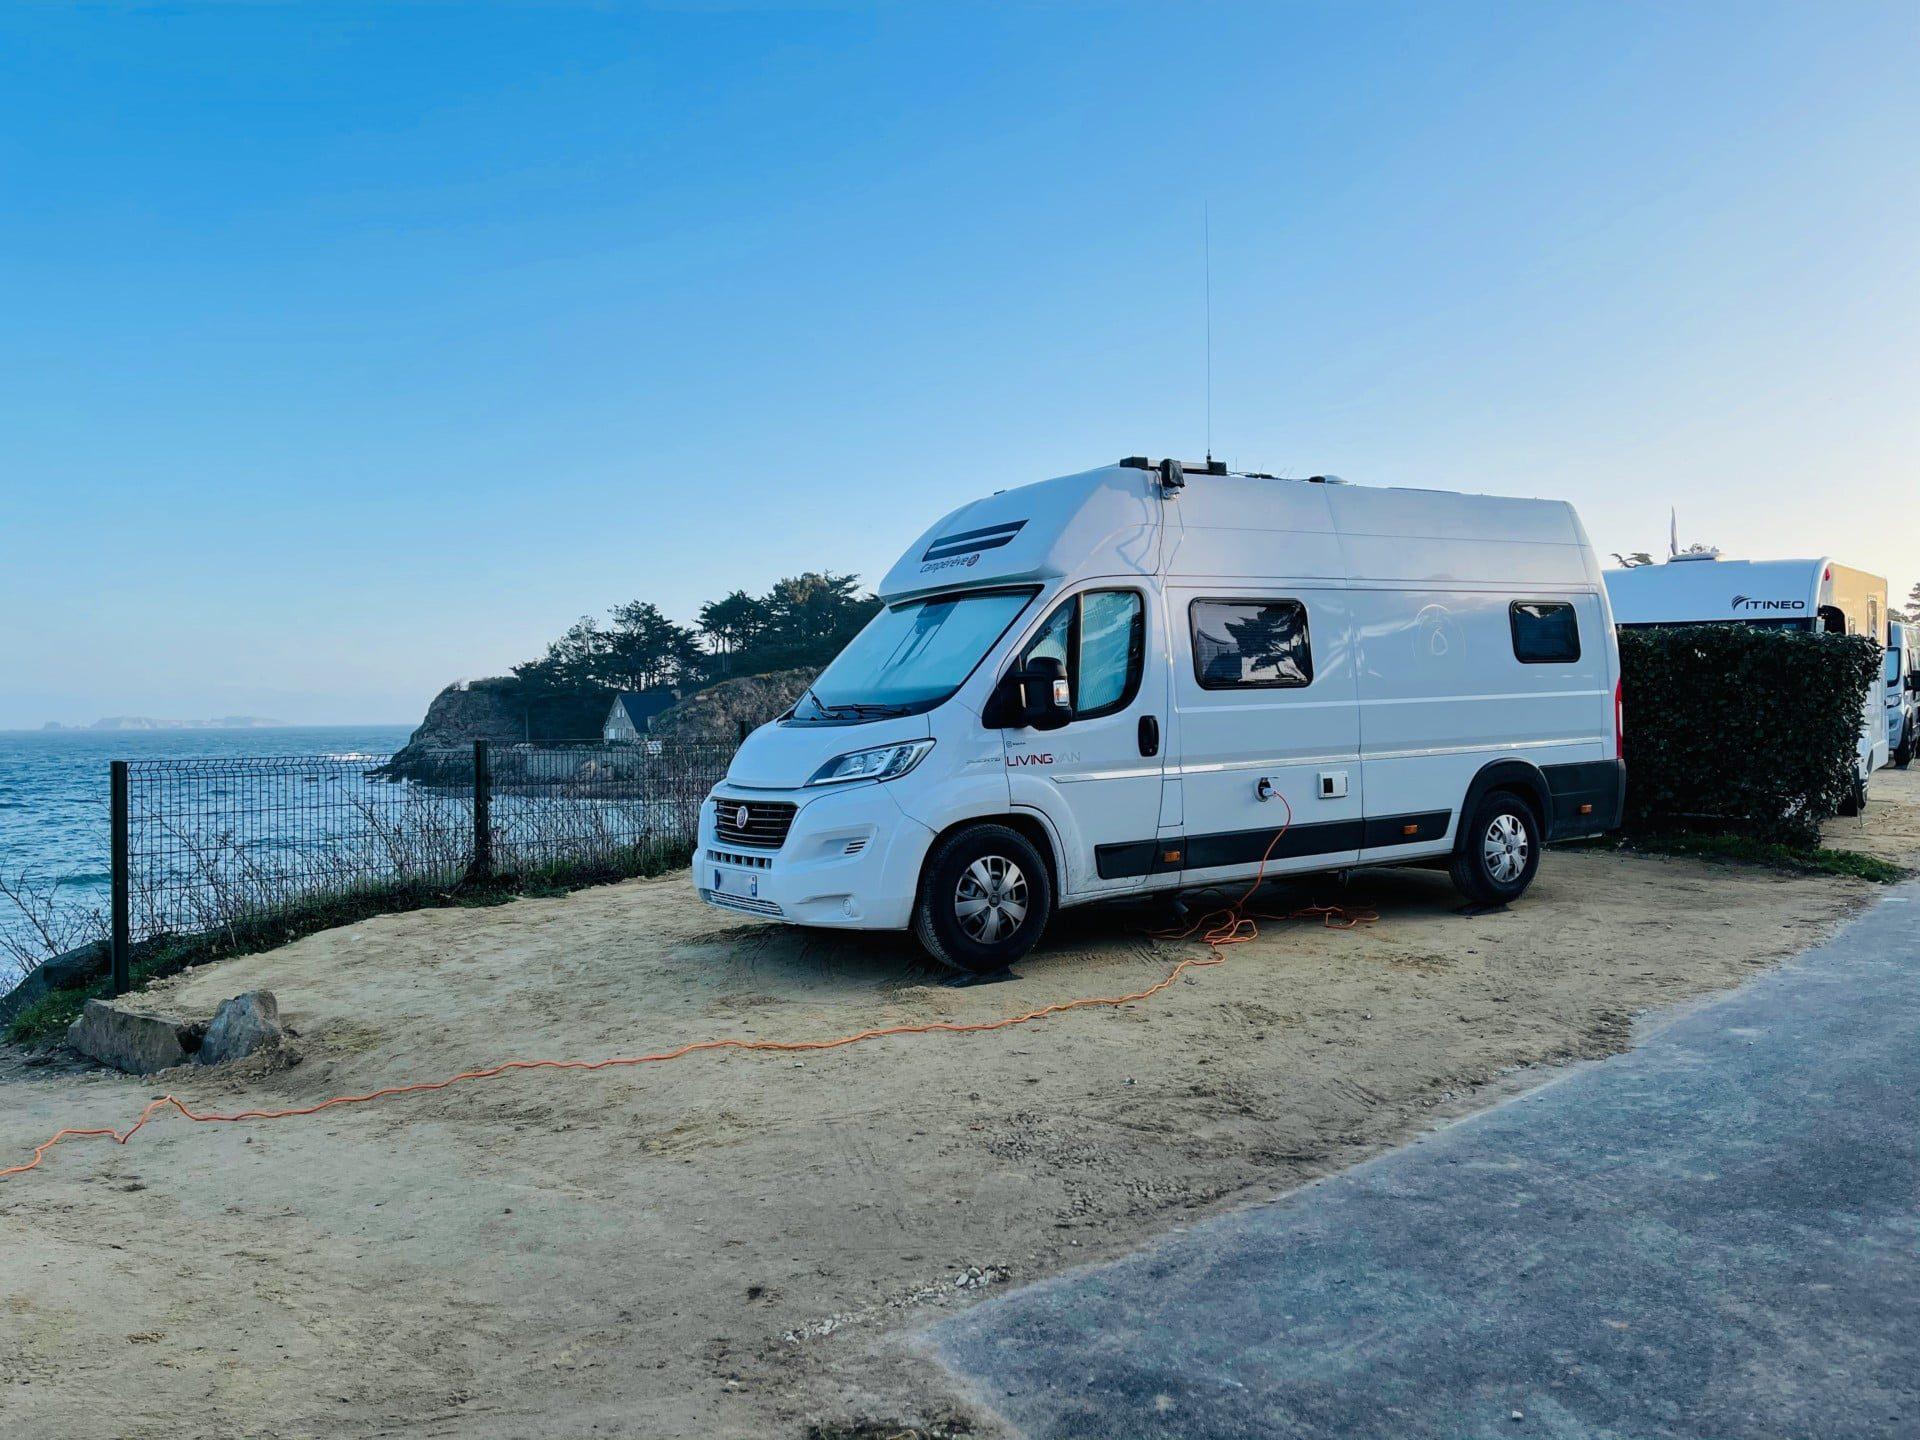 Camping-Port-Blanc-DINARD-Bretagne-Dinard-Côte-dÉmeraude-Vacances-Vue-Mer-1